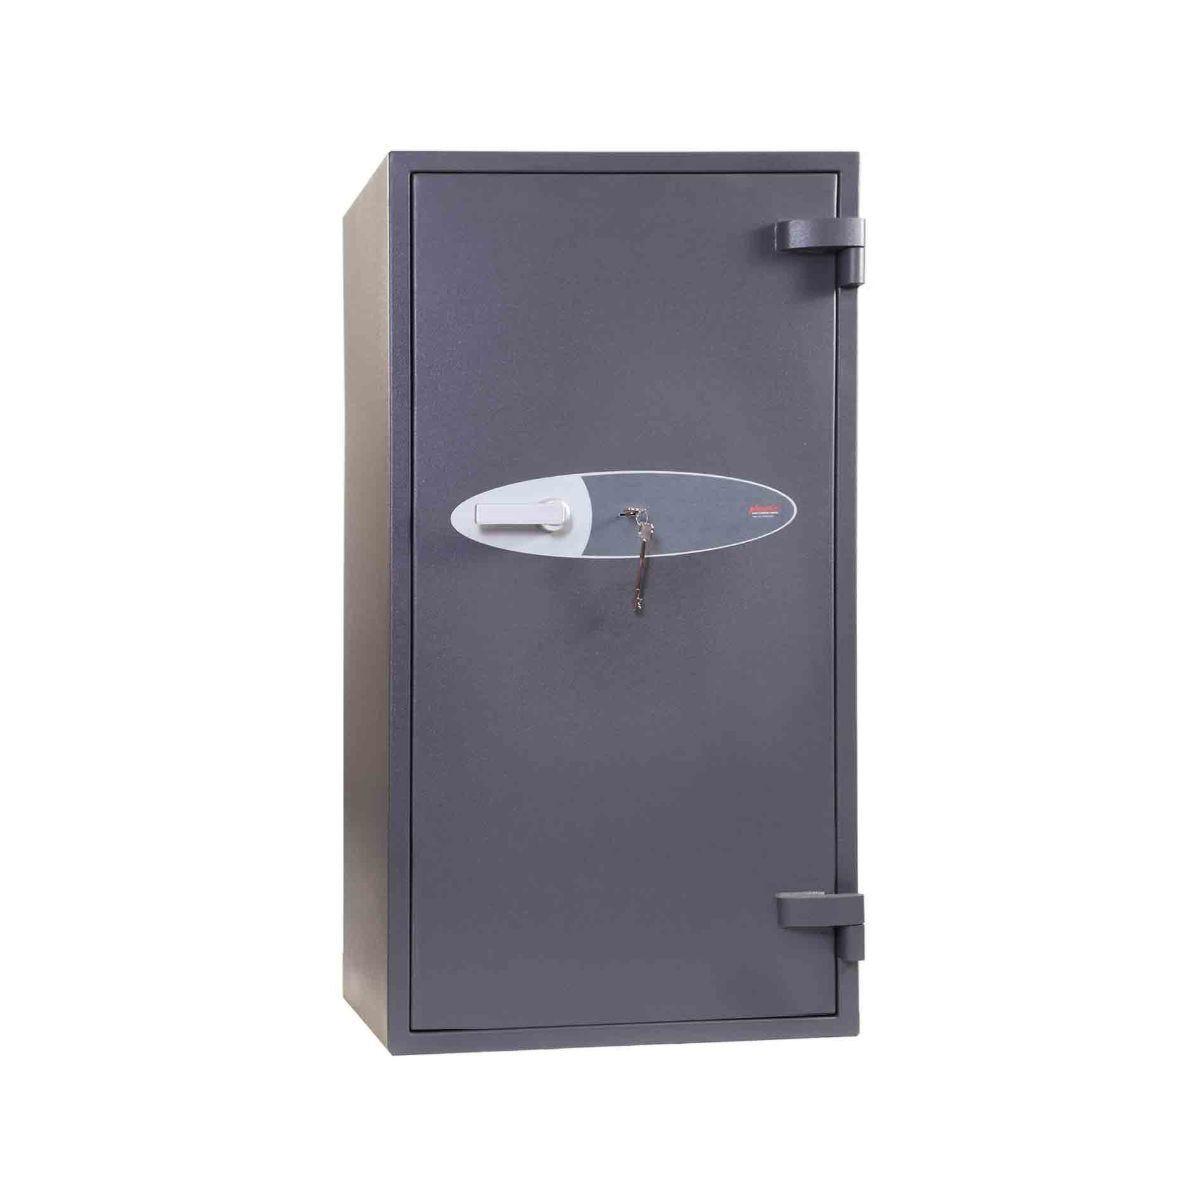 Phoenix Neptune HS1055K High Security Euro Grade 1 Safe with Key Lock Size 5